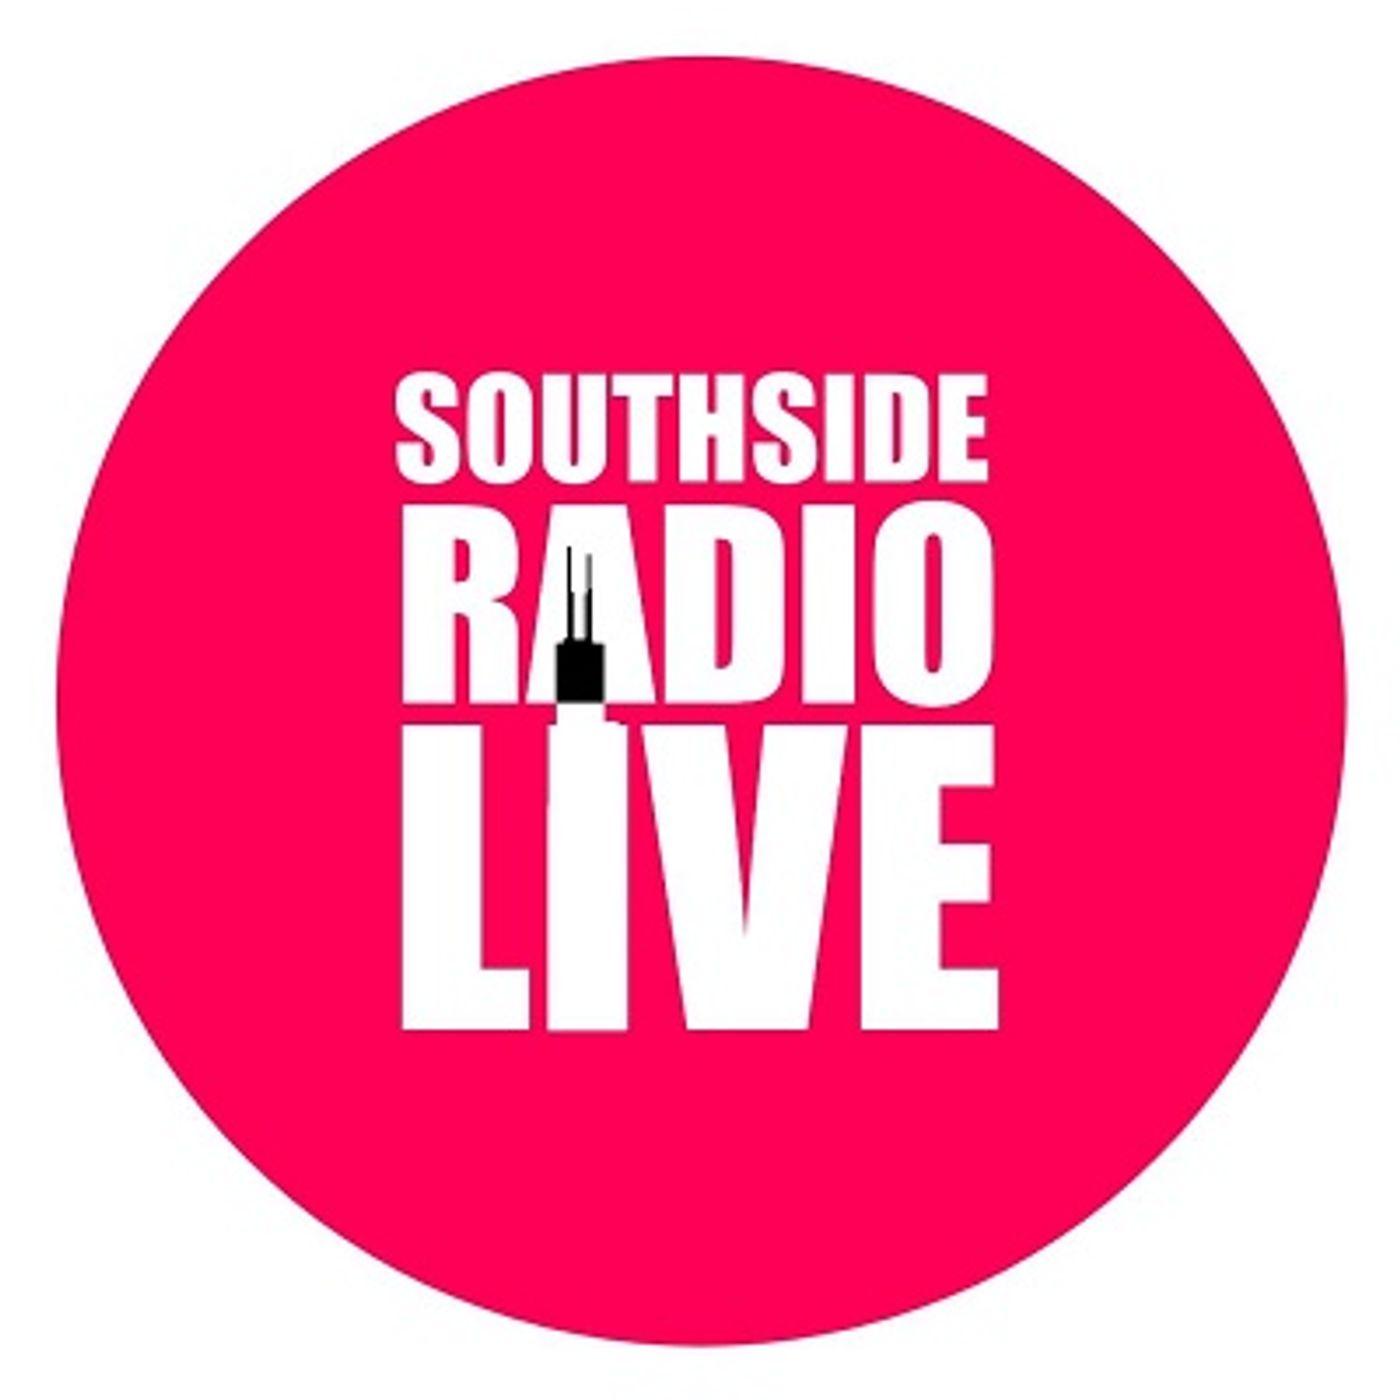 SouthSideRadio.live